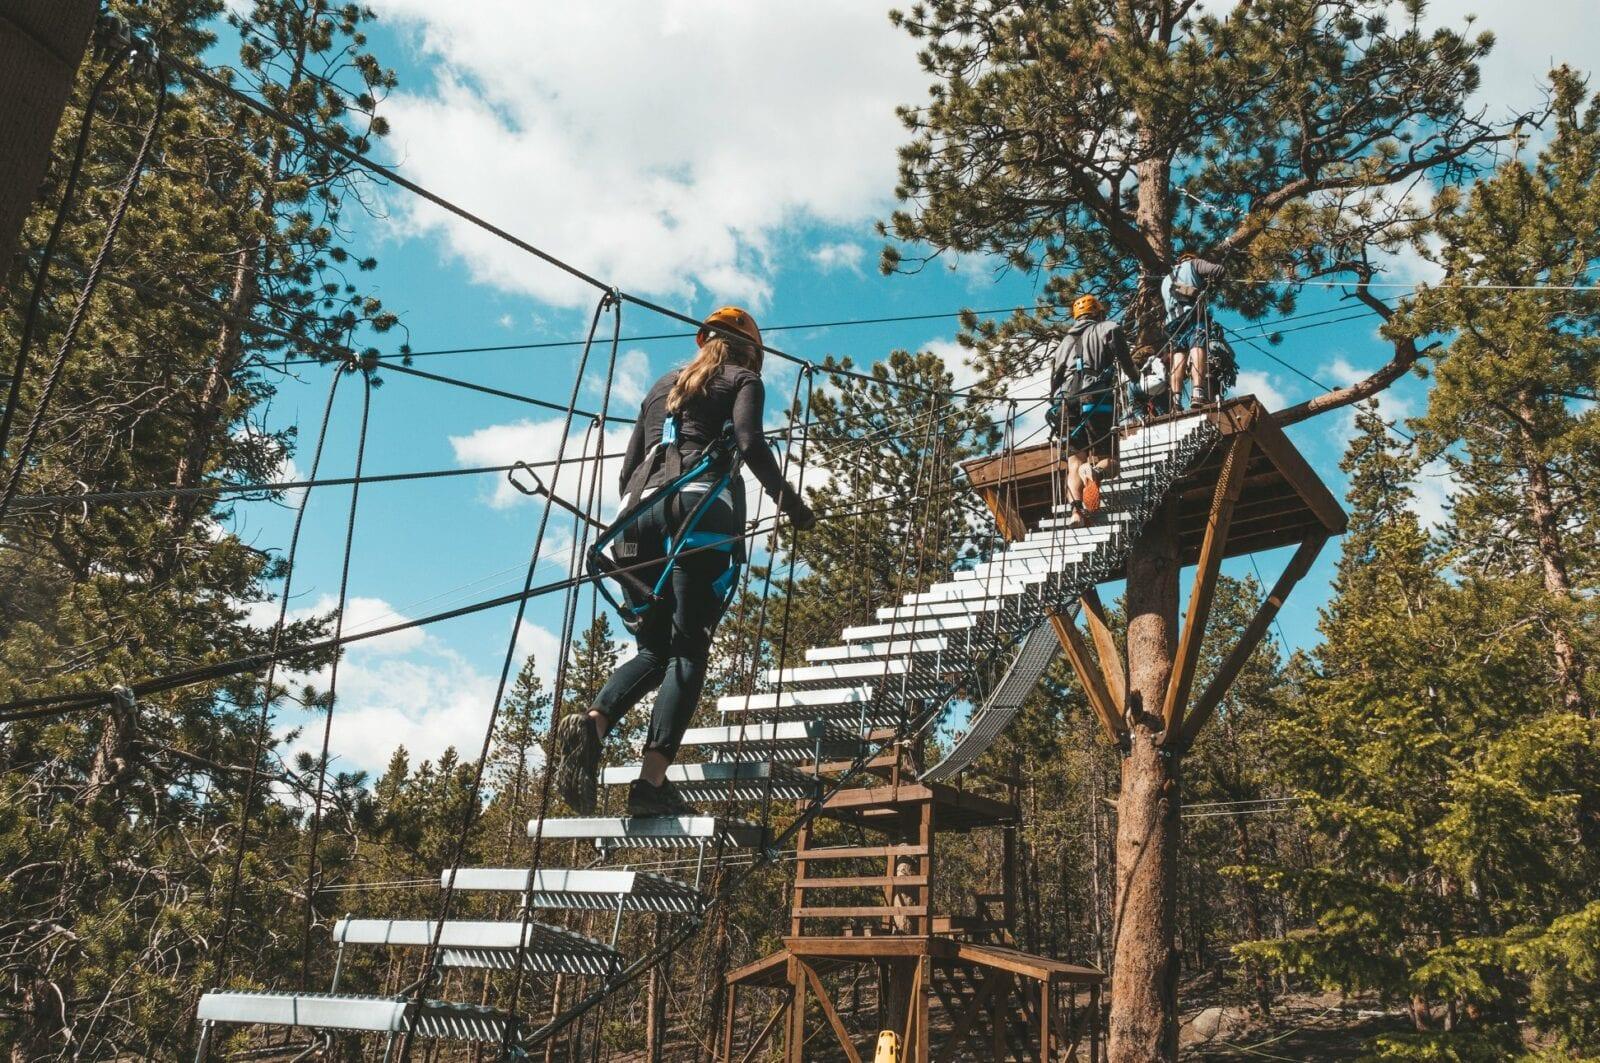 Image of adventurers on the Mount Evans Via Ferrata in Idaho Springs, Colorado